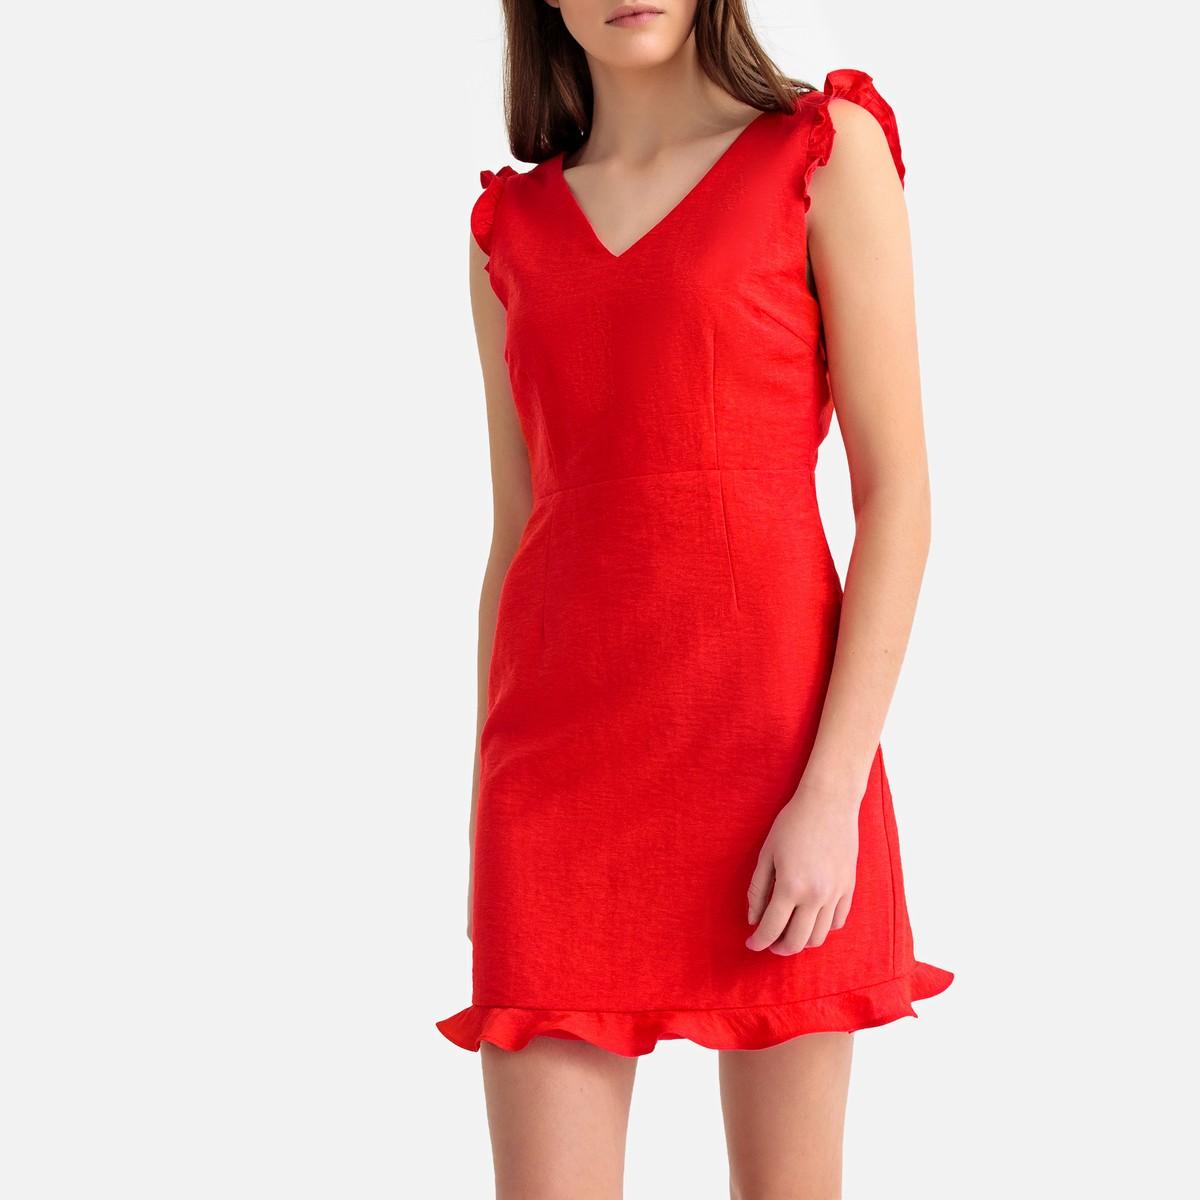 f642820d6059 SUNCOO Φόρεμα με βολάν και άνοιγμα στην πλάτη - Glami.gr